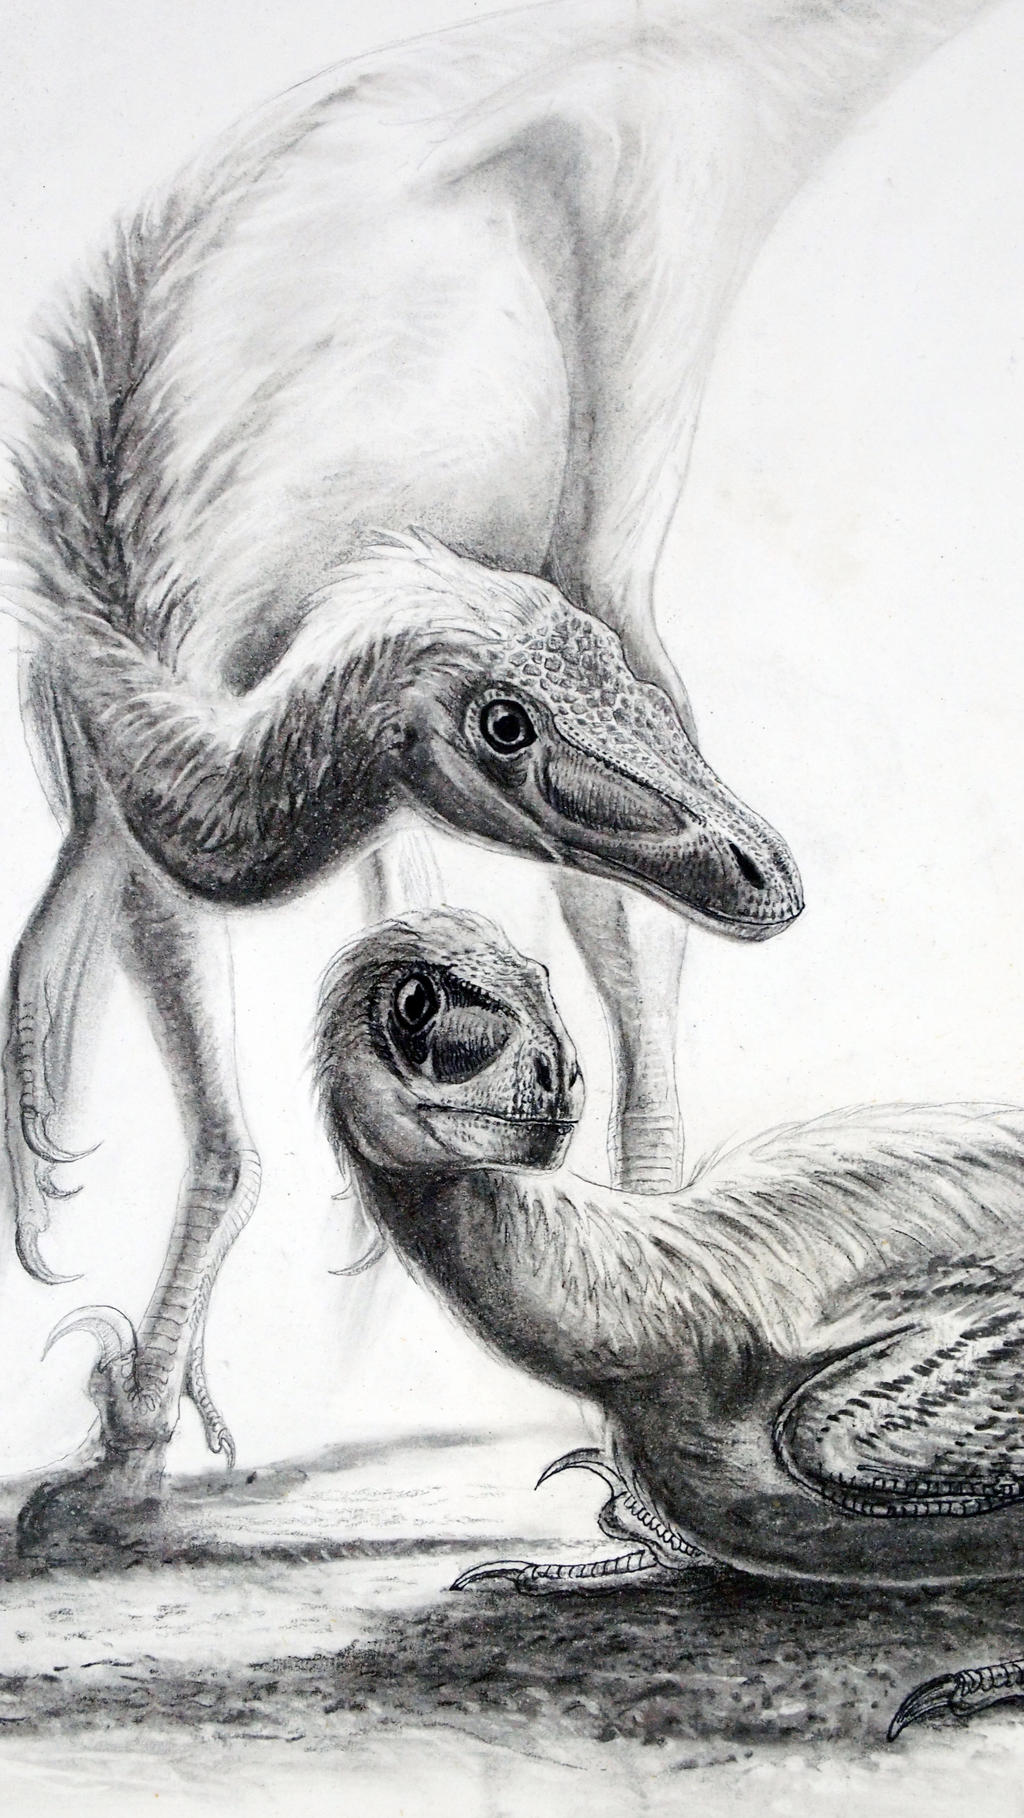 Jehol Biota--Graciliraptor lujiatunensis--Close-up